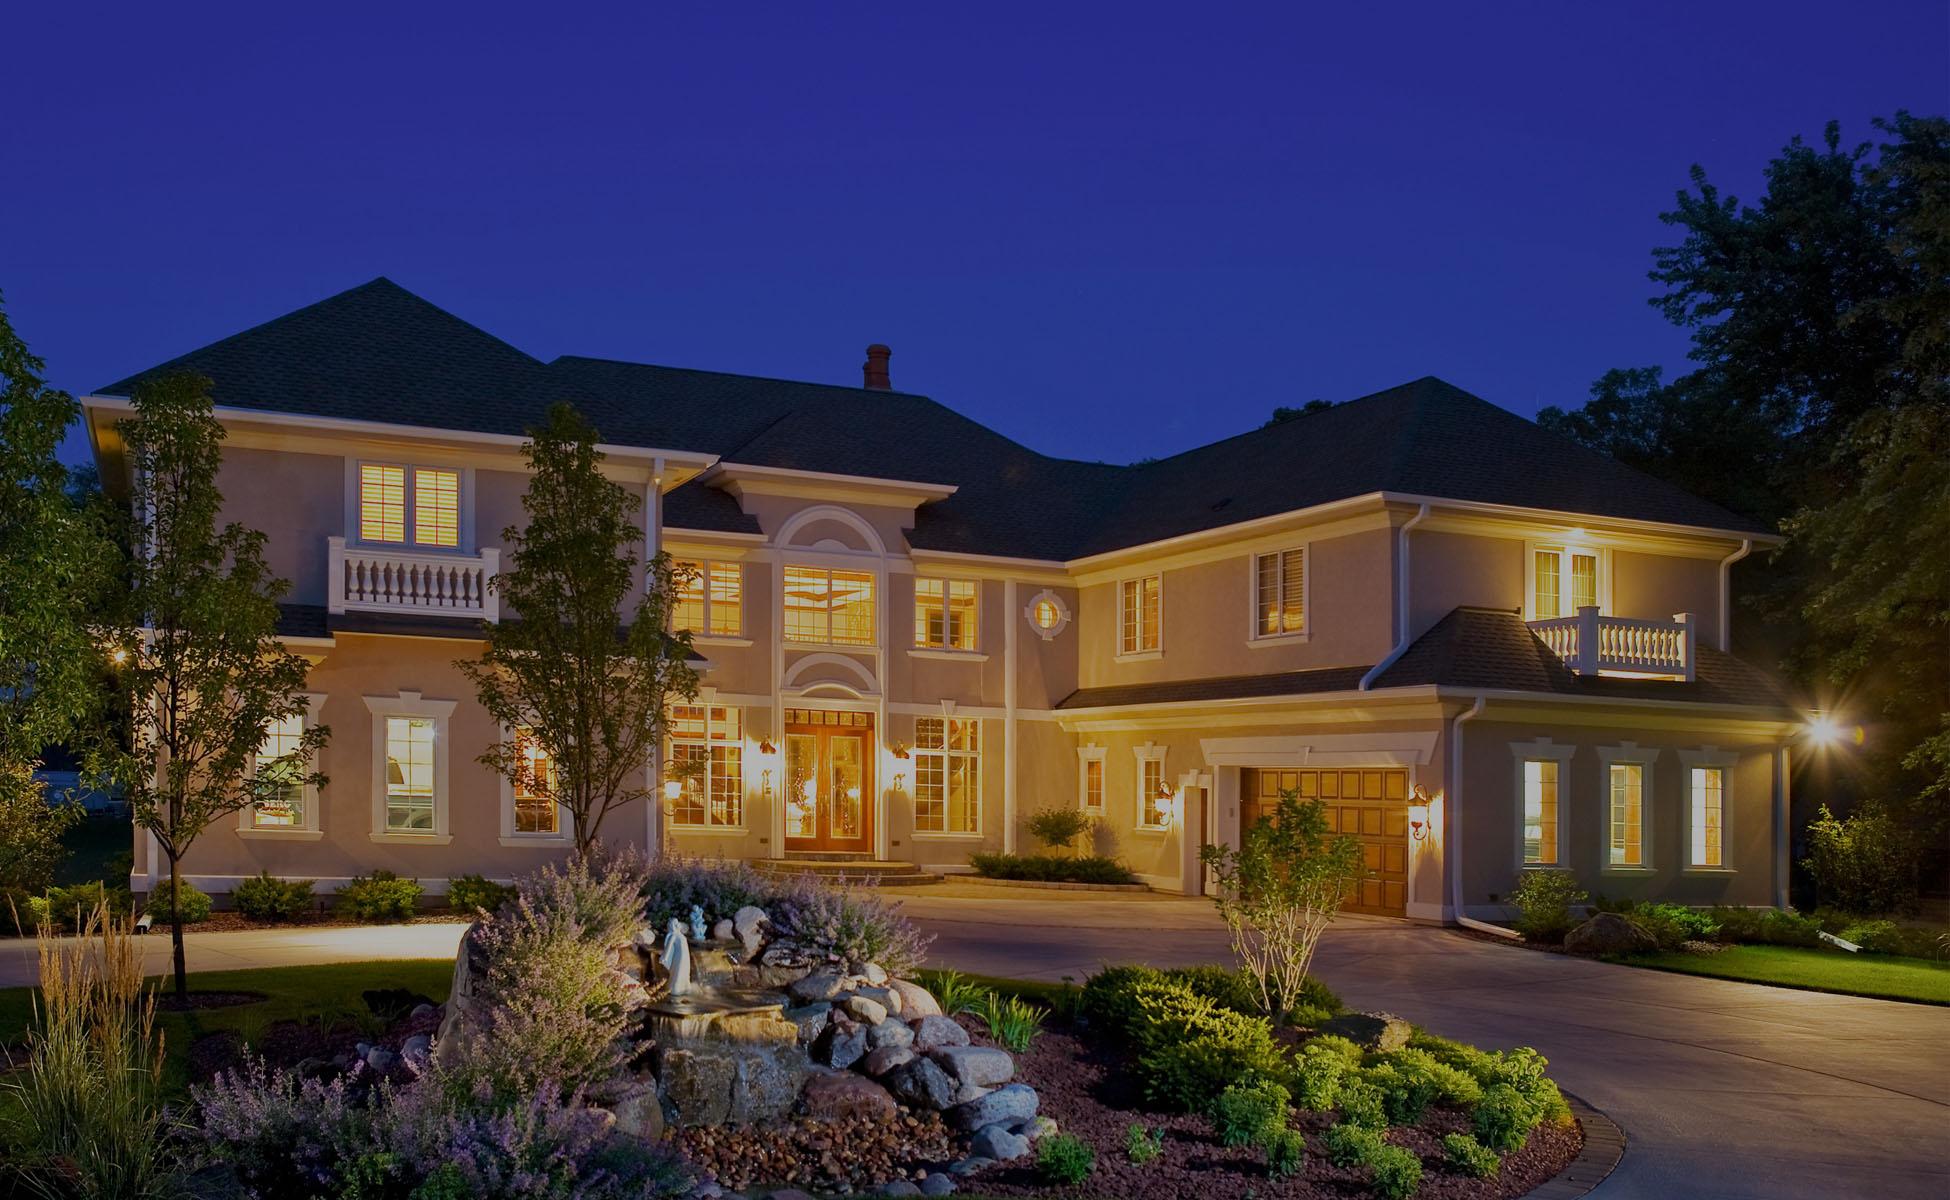 Barenzbuilders custom home builder in wisconsin for Home builders wisconsin